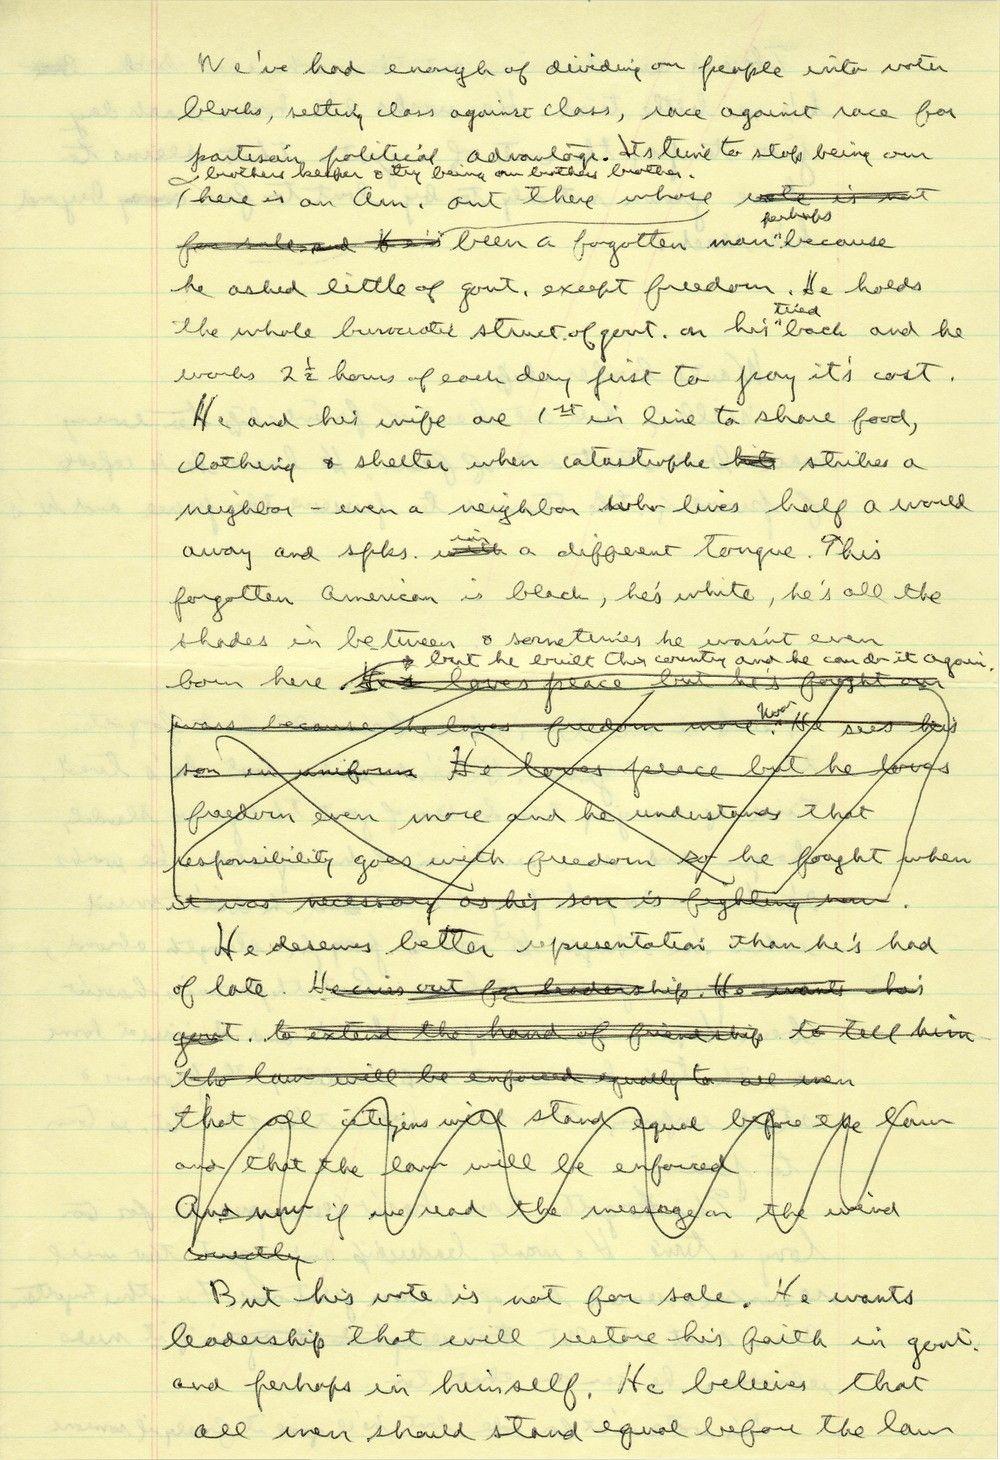 Page 15 transcript